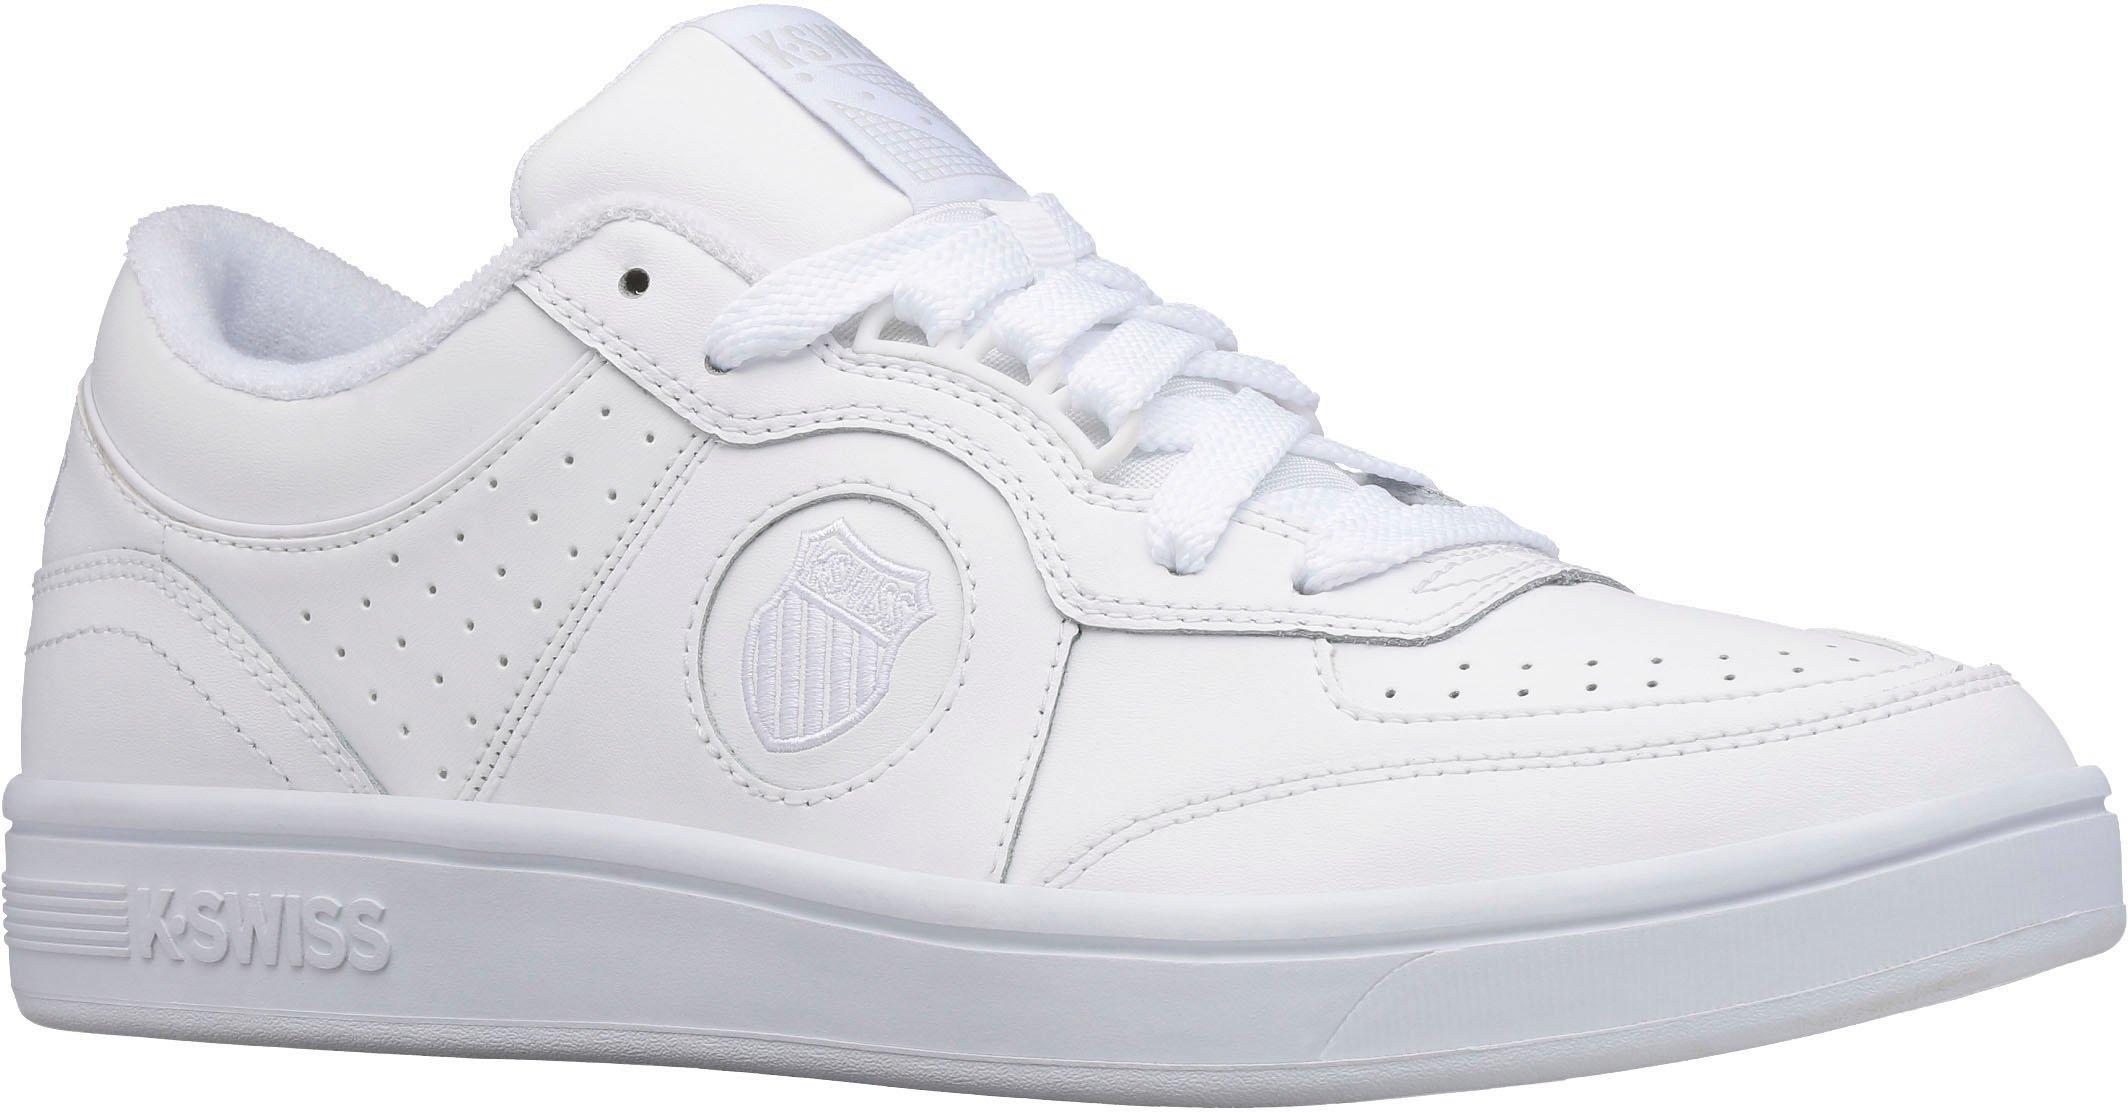 K-Swiss sneakers North Court M - verschillende betaalmethodes